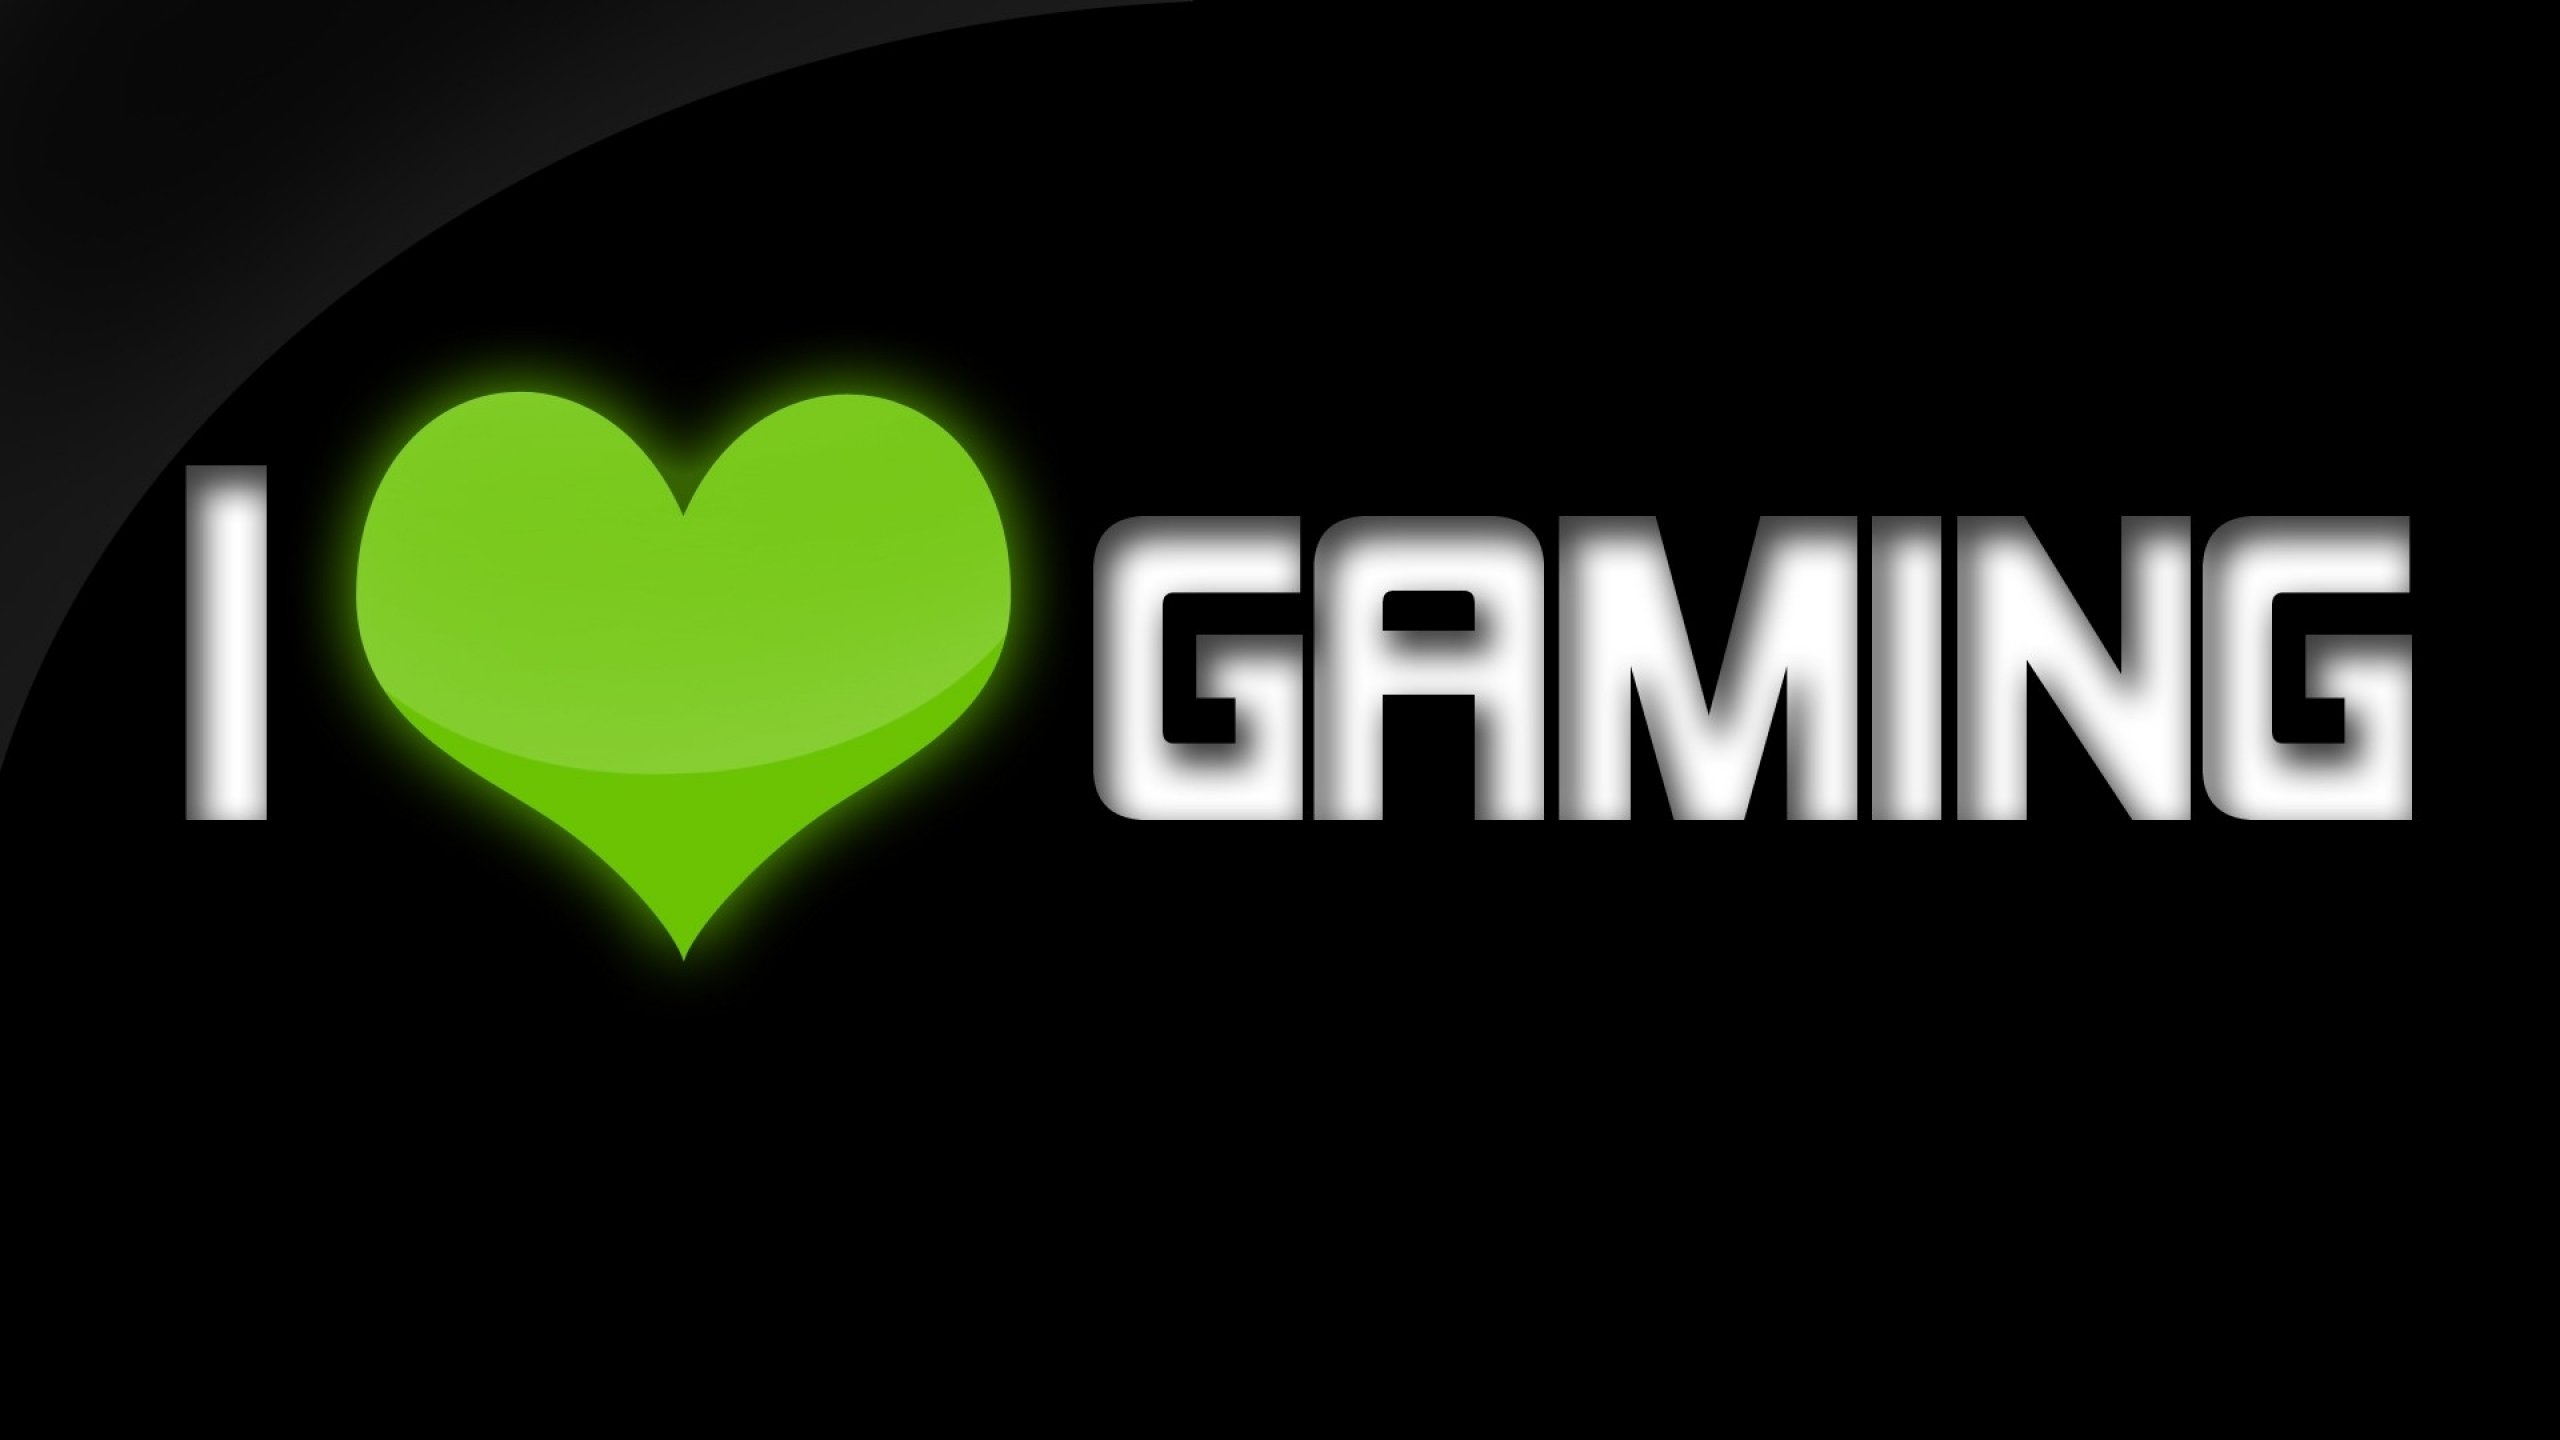 Gaming 2560x1440 Good Galleries 2560x1440